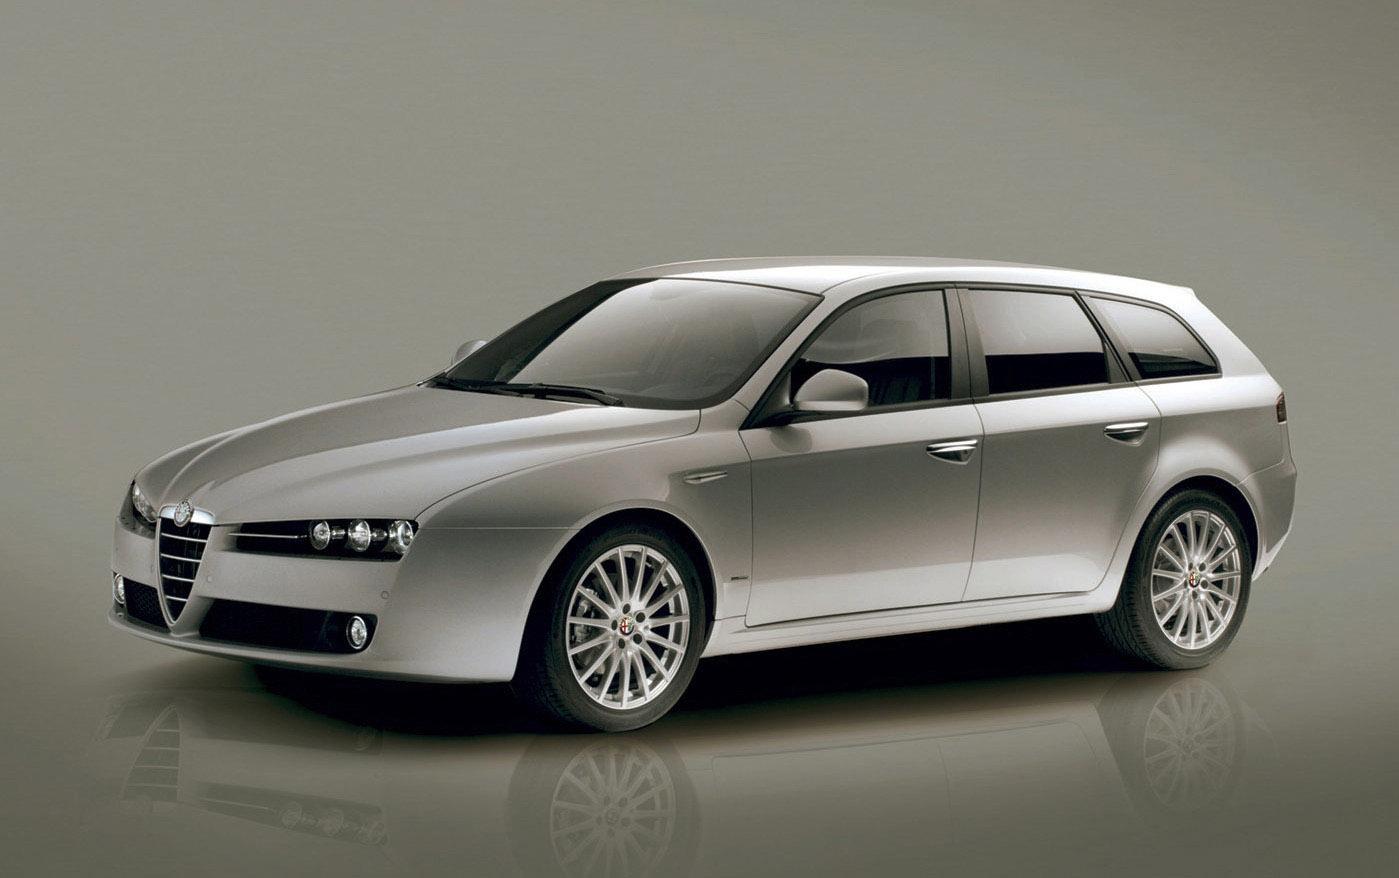 Alfa Romeo 159 Sportwagon photo #1